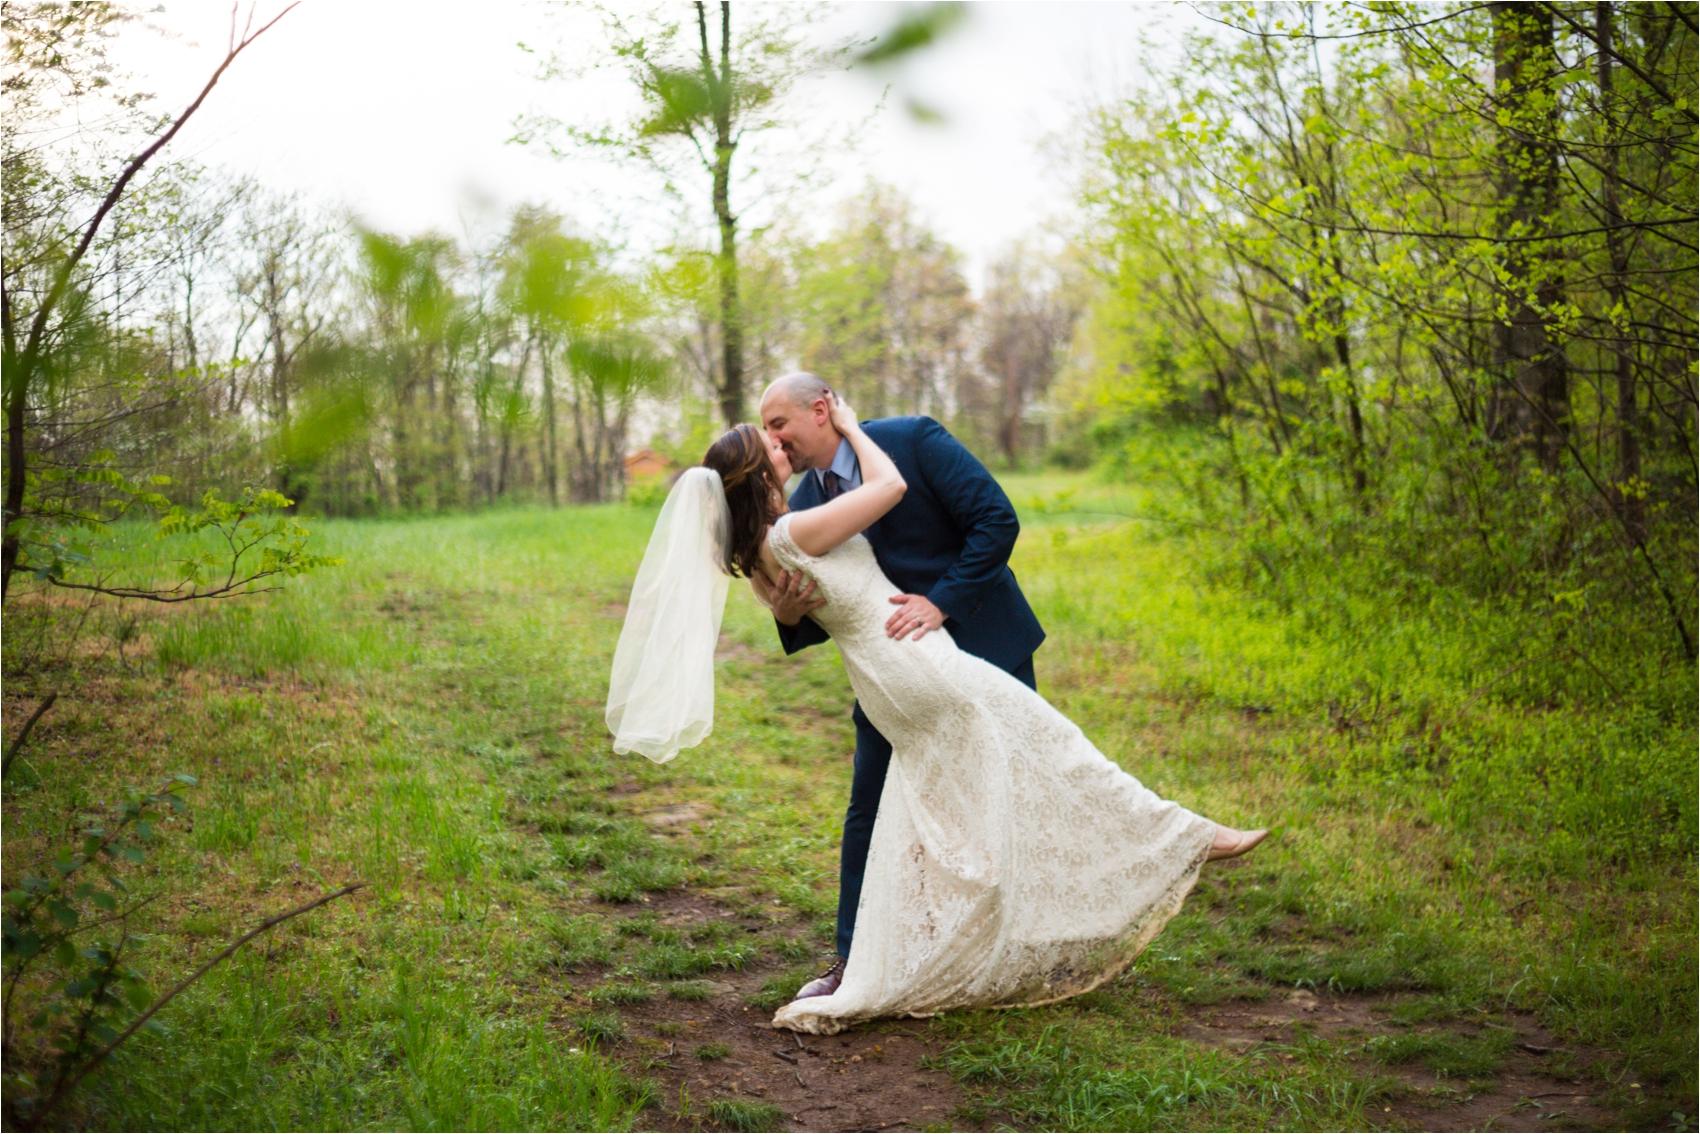 Lydia-Mountain-Spring-Virginia-Wedding-1192.jpg